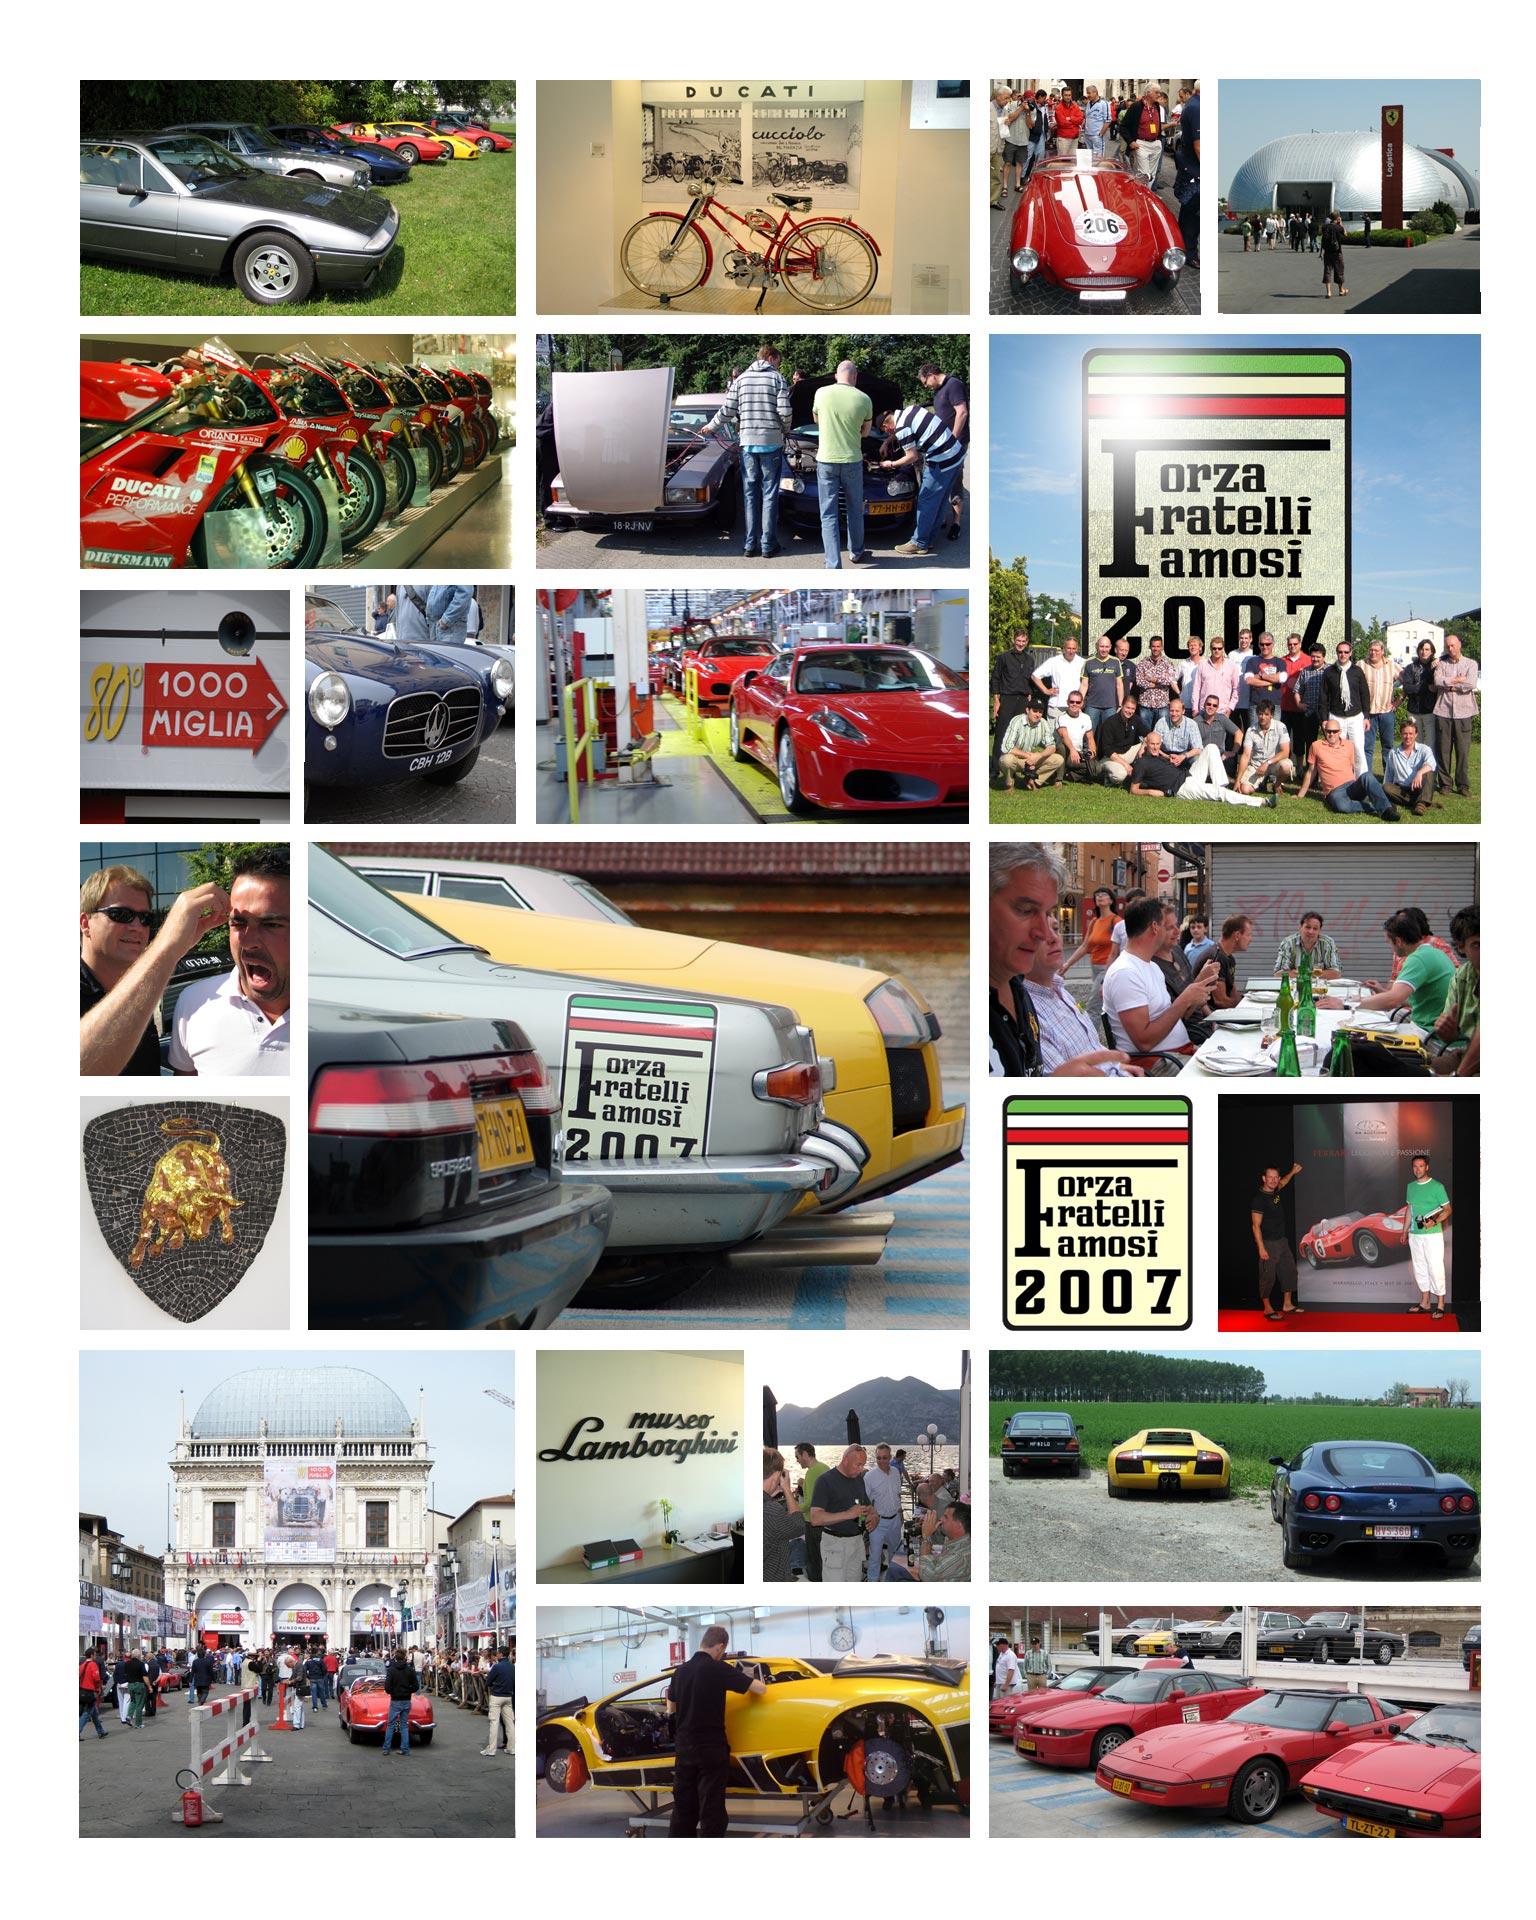 2007: Ferrari, Lamborghini...